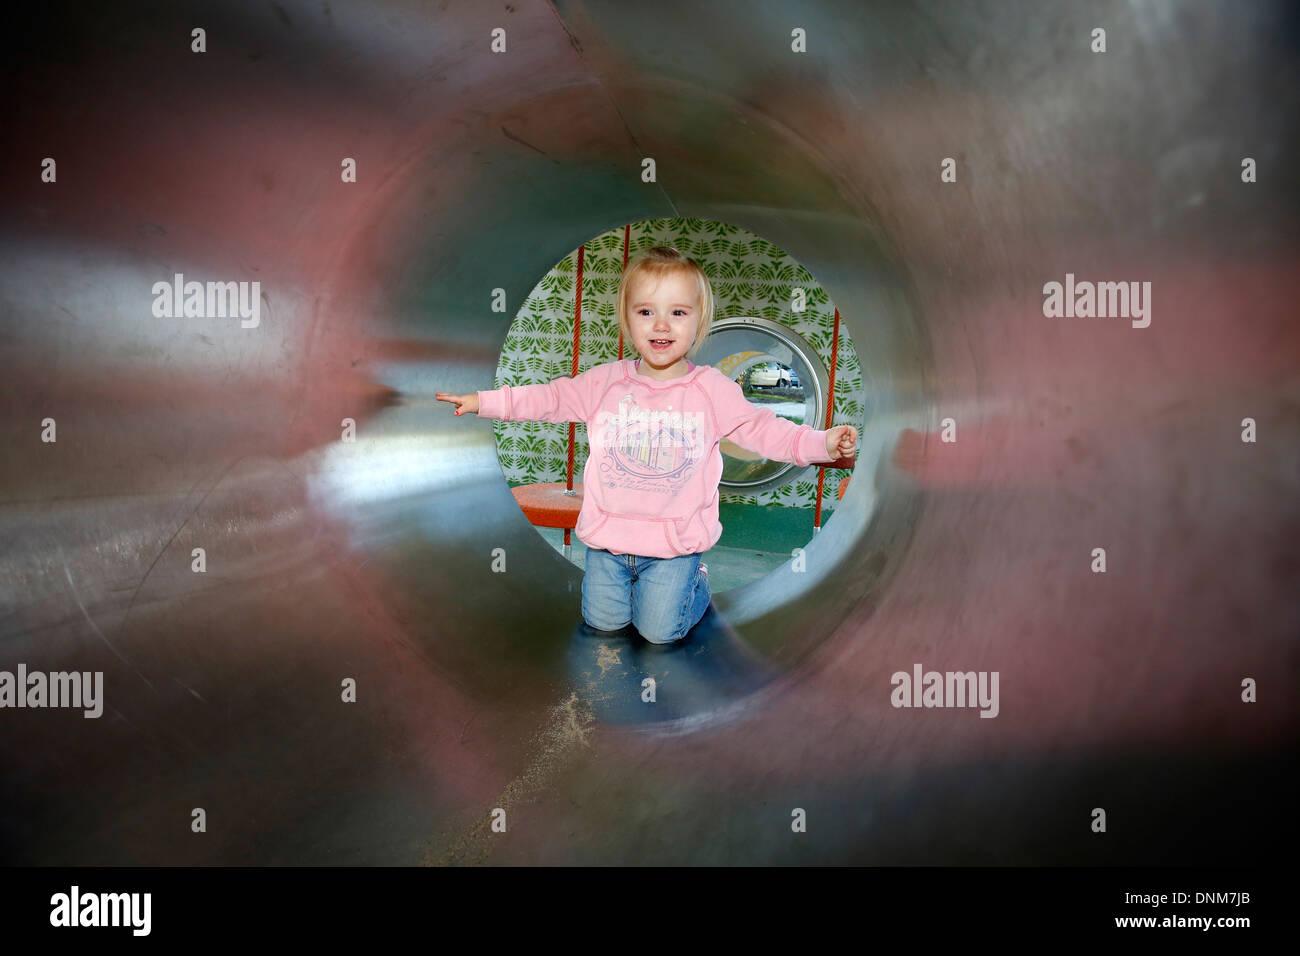 Oberhausen, Germany, a modern children's playground - Stock Image